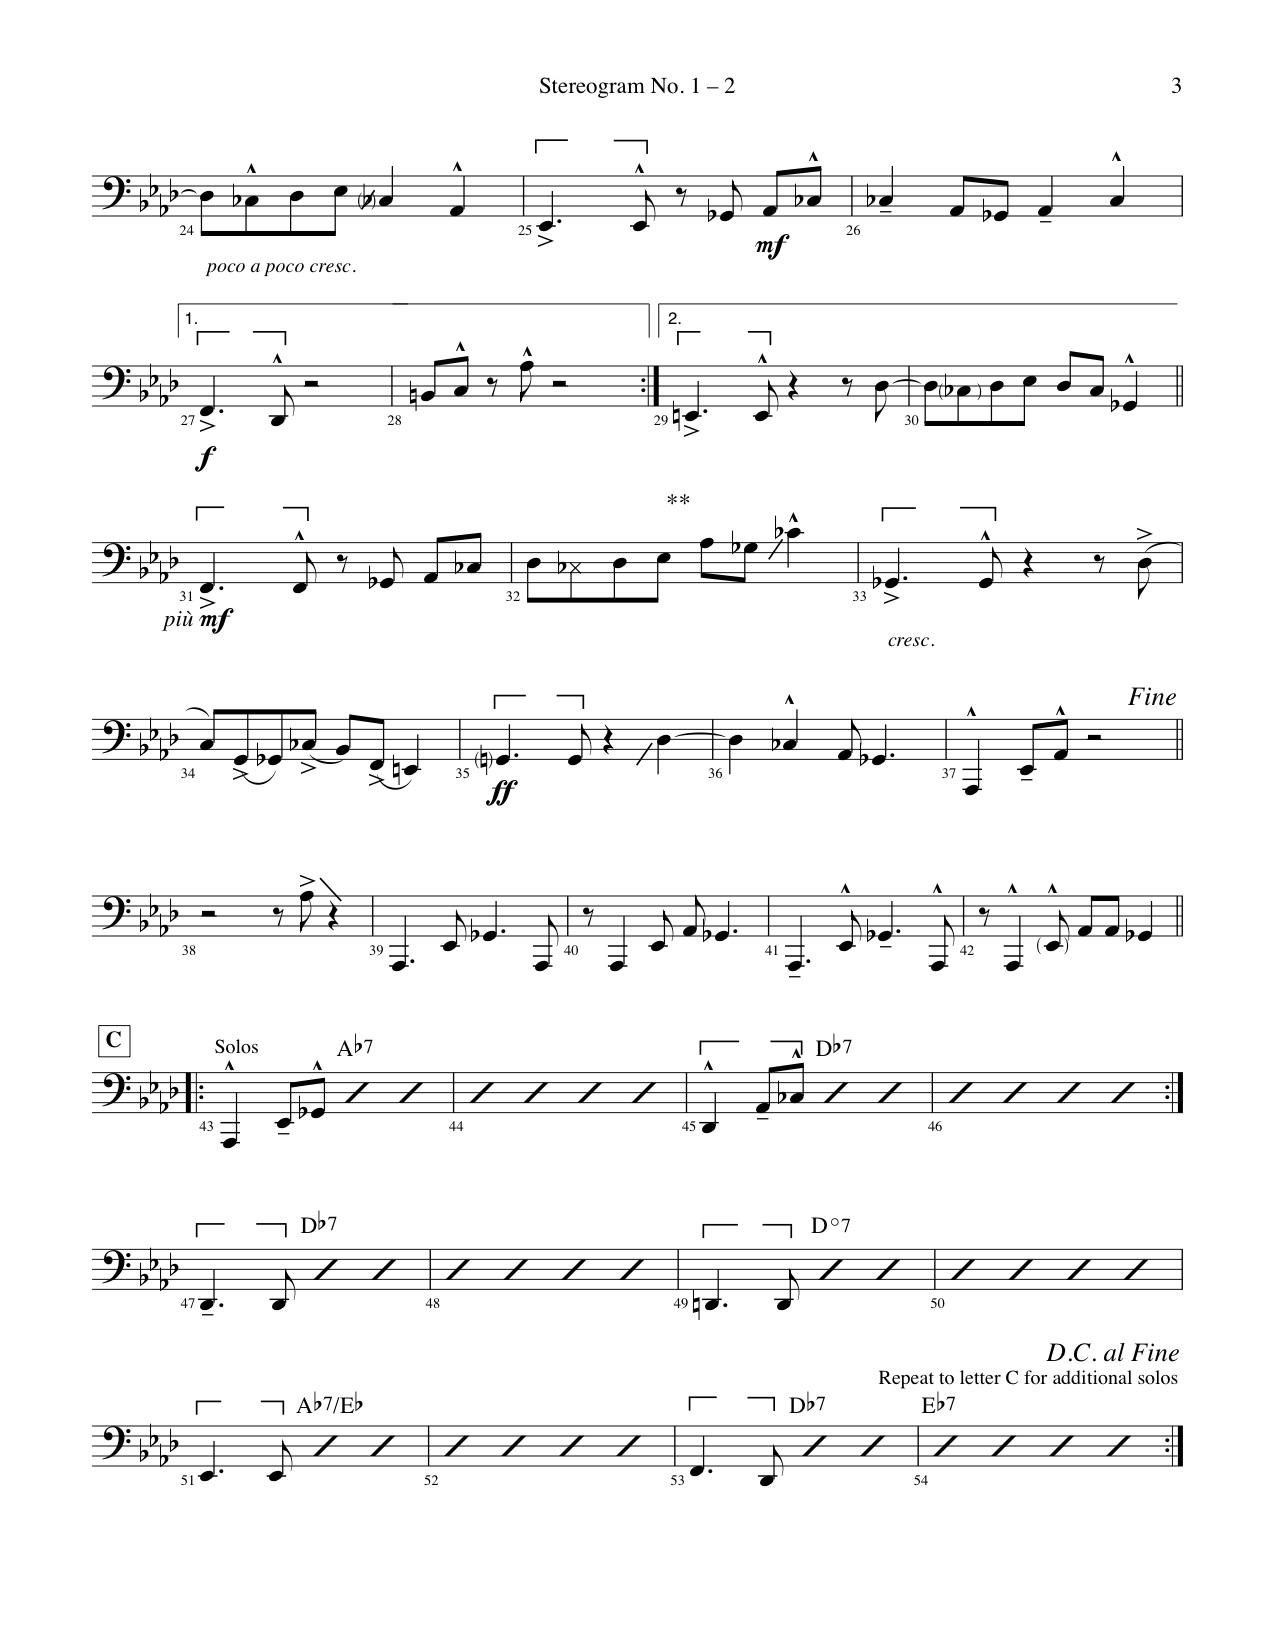 1 Stereogram Bone page 2